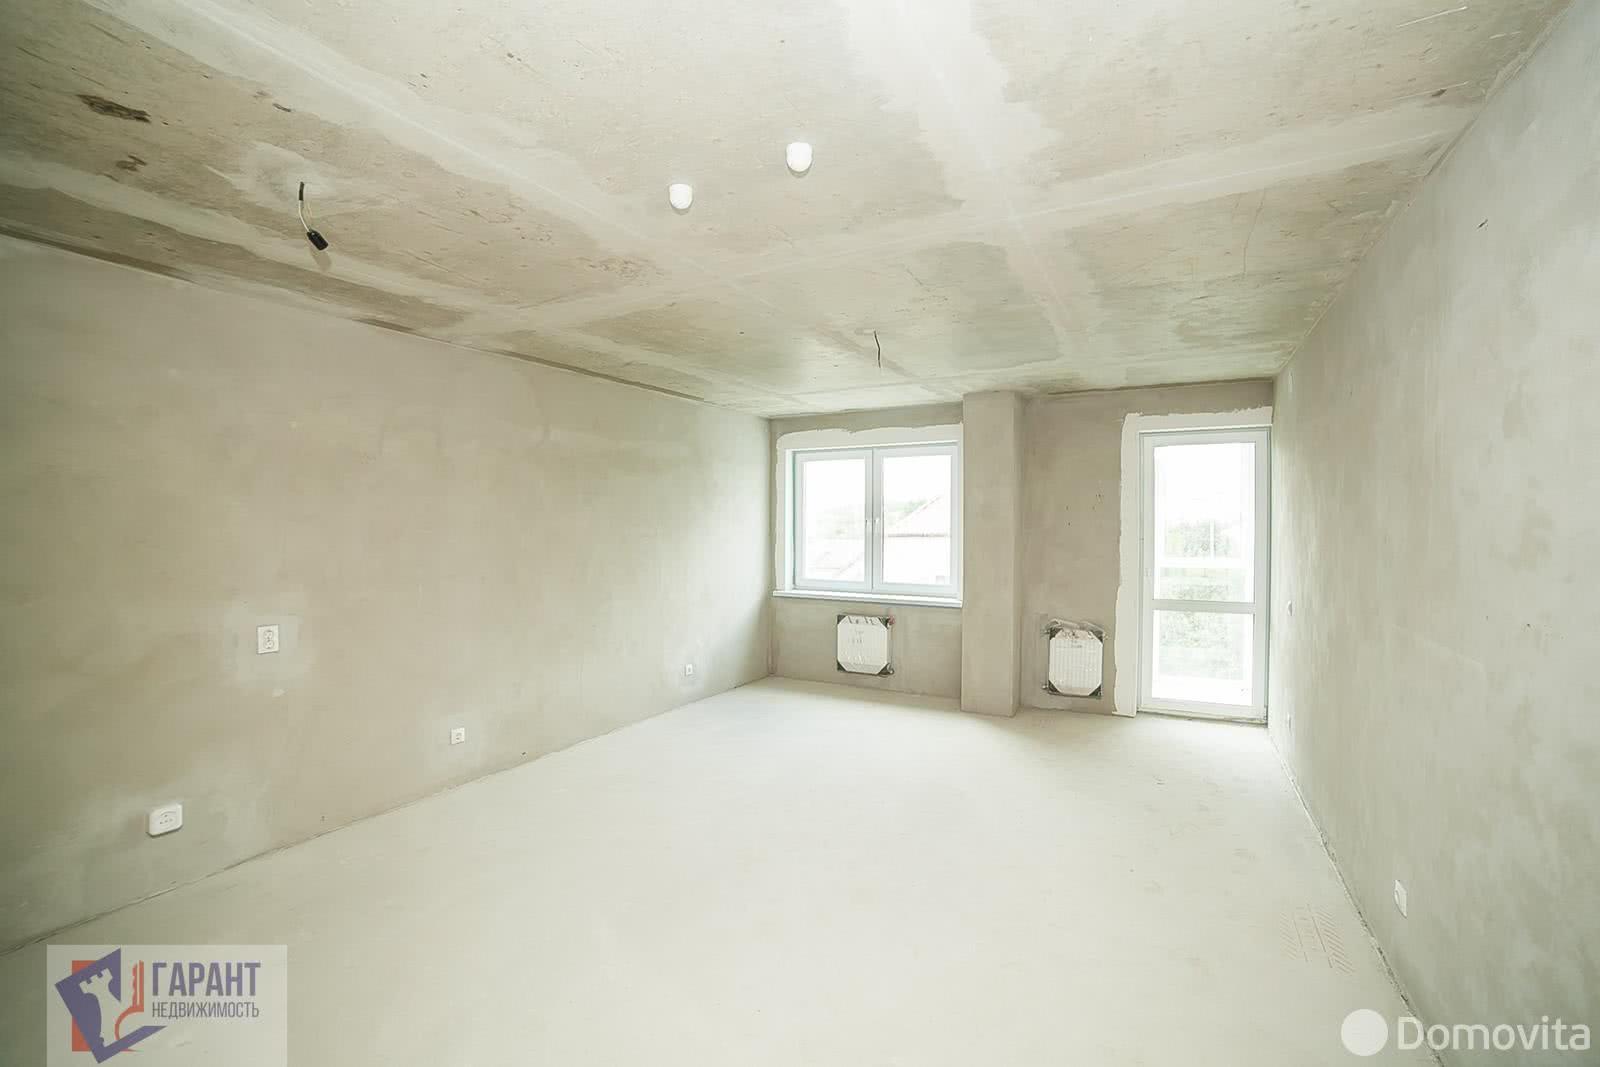 Купить 1-комнатную квартиру в Минске, пер. Зубачева 3-й, д. 5 - фото 2